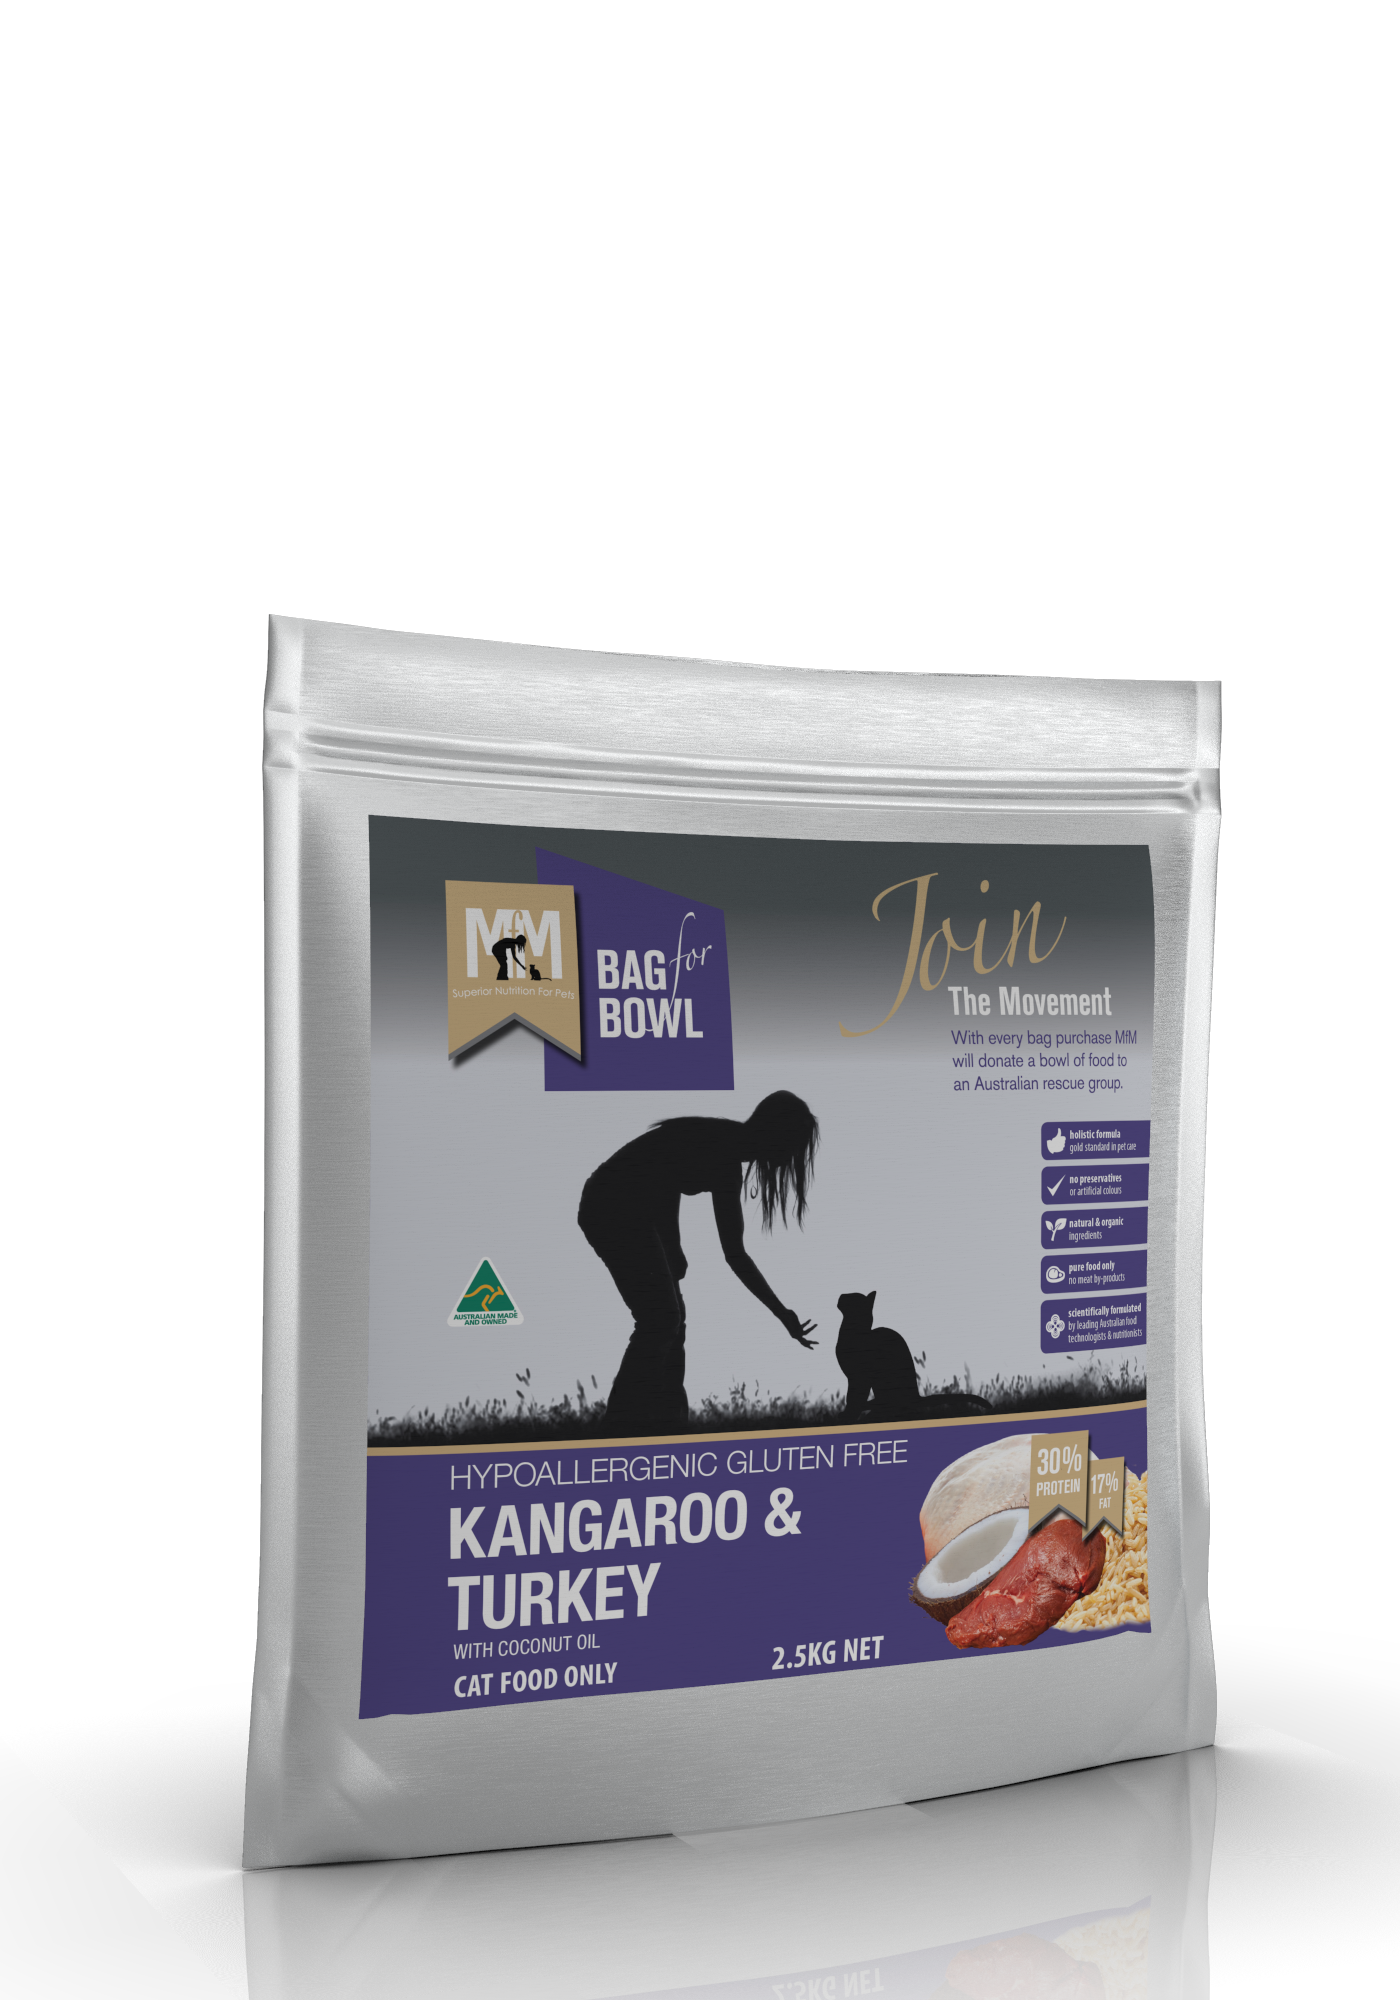 Kangaroo & Turkey - Meals For Mutts Australia